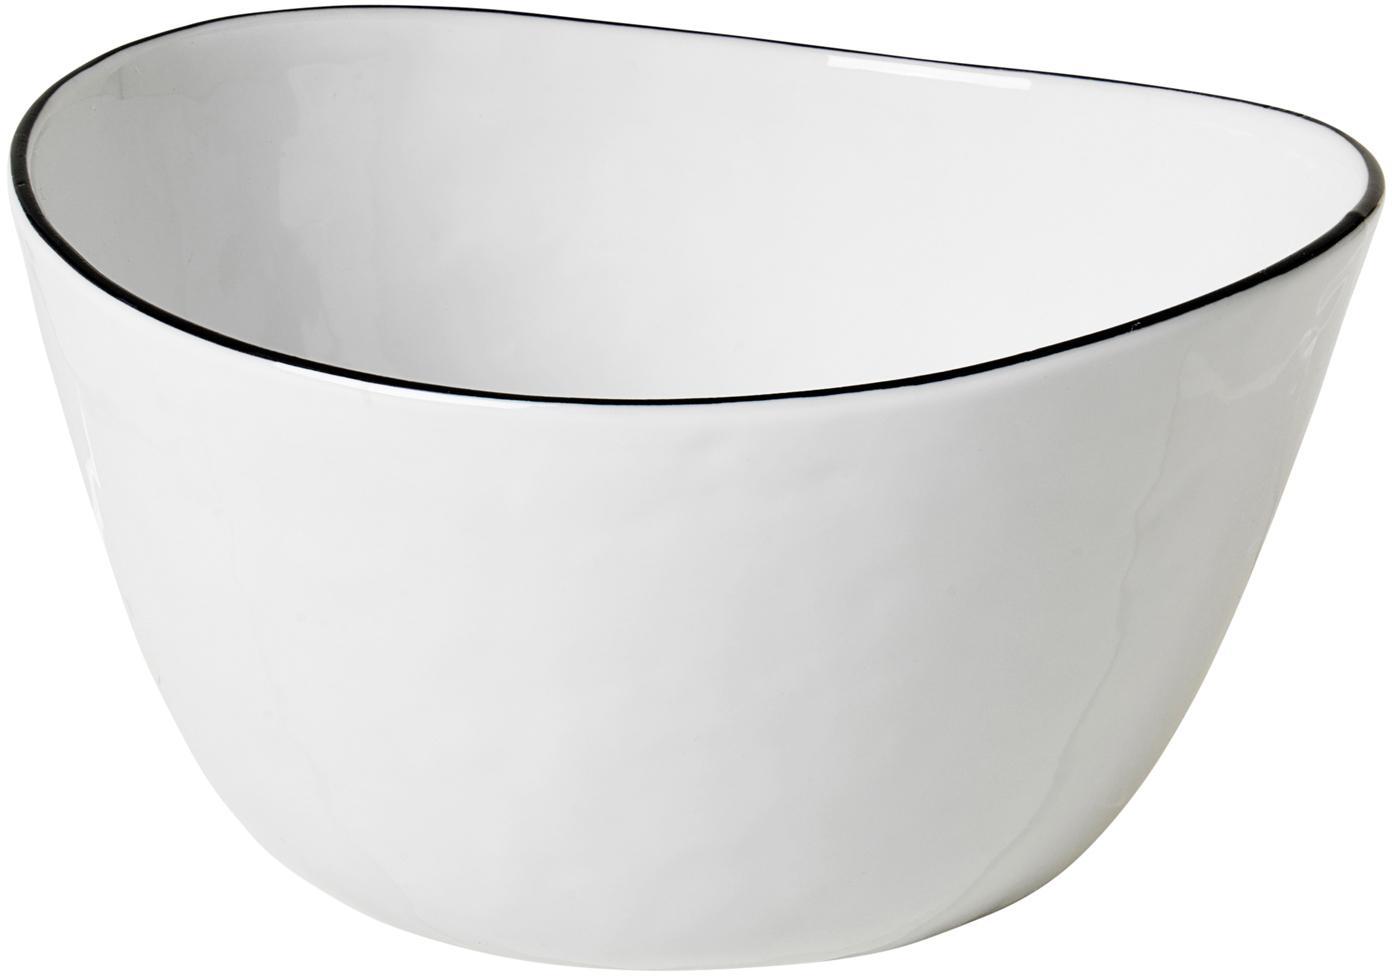 Bol artesanal Salt, Porcelana, Blanco crudo, negro, An 20 x F 19 cm